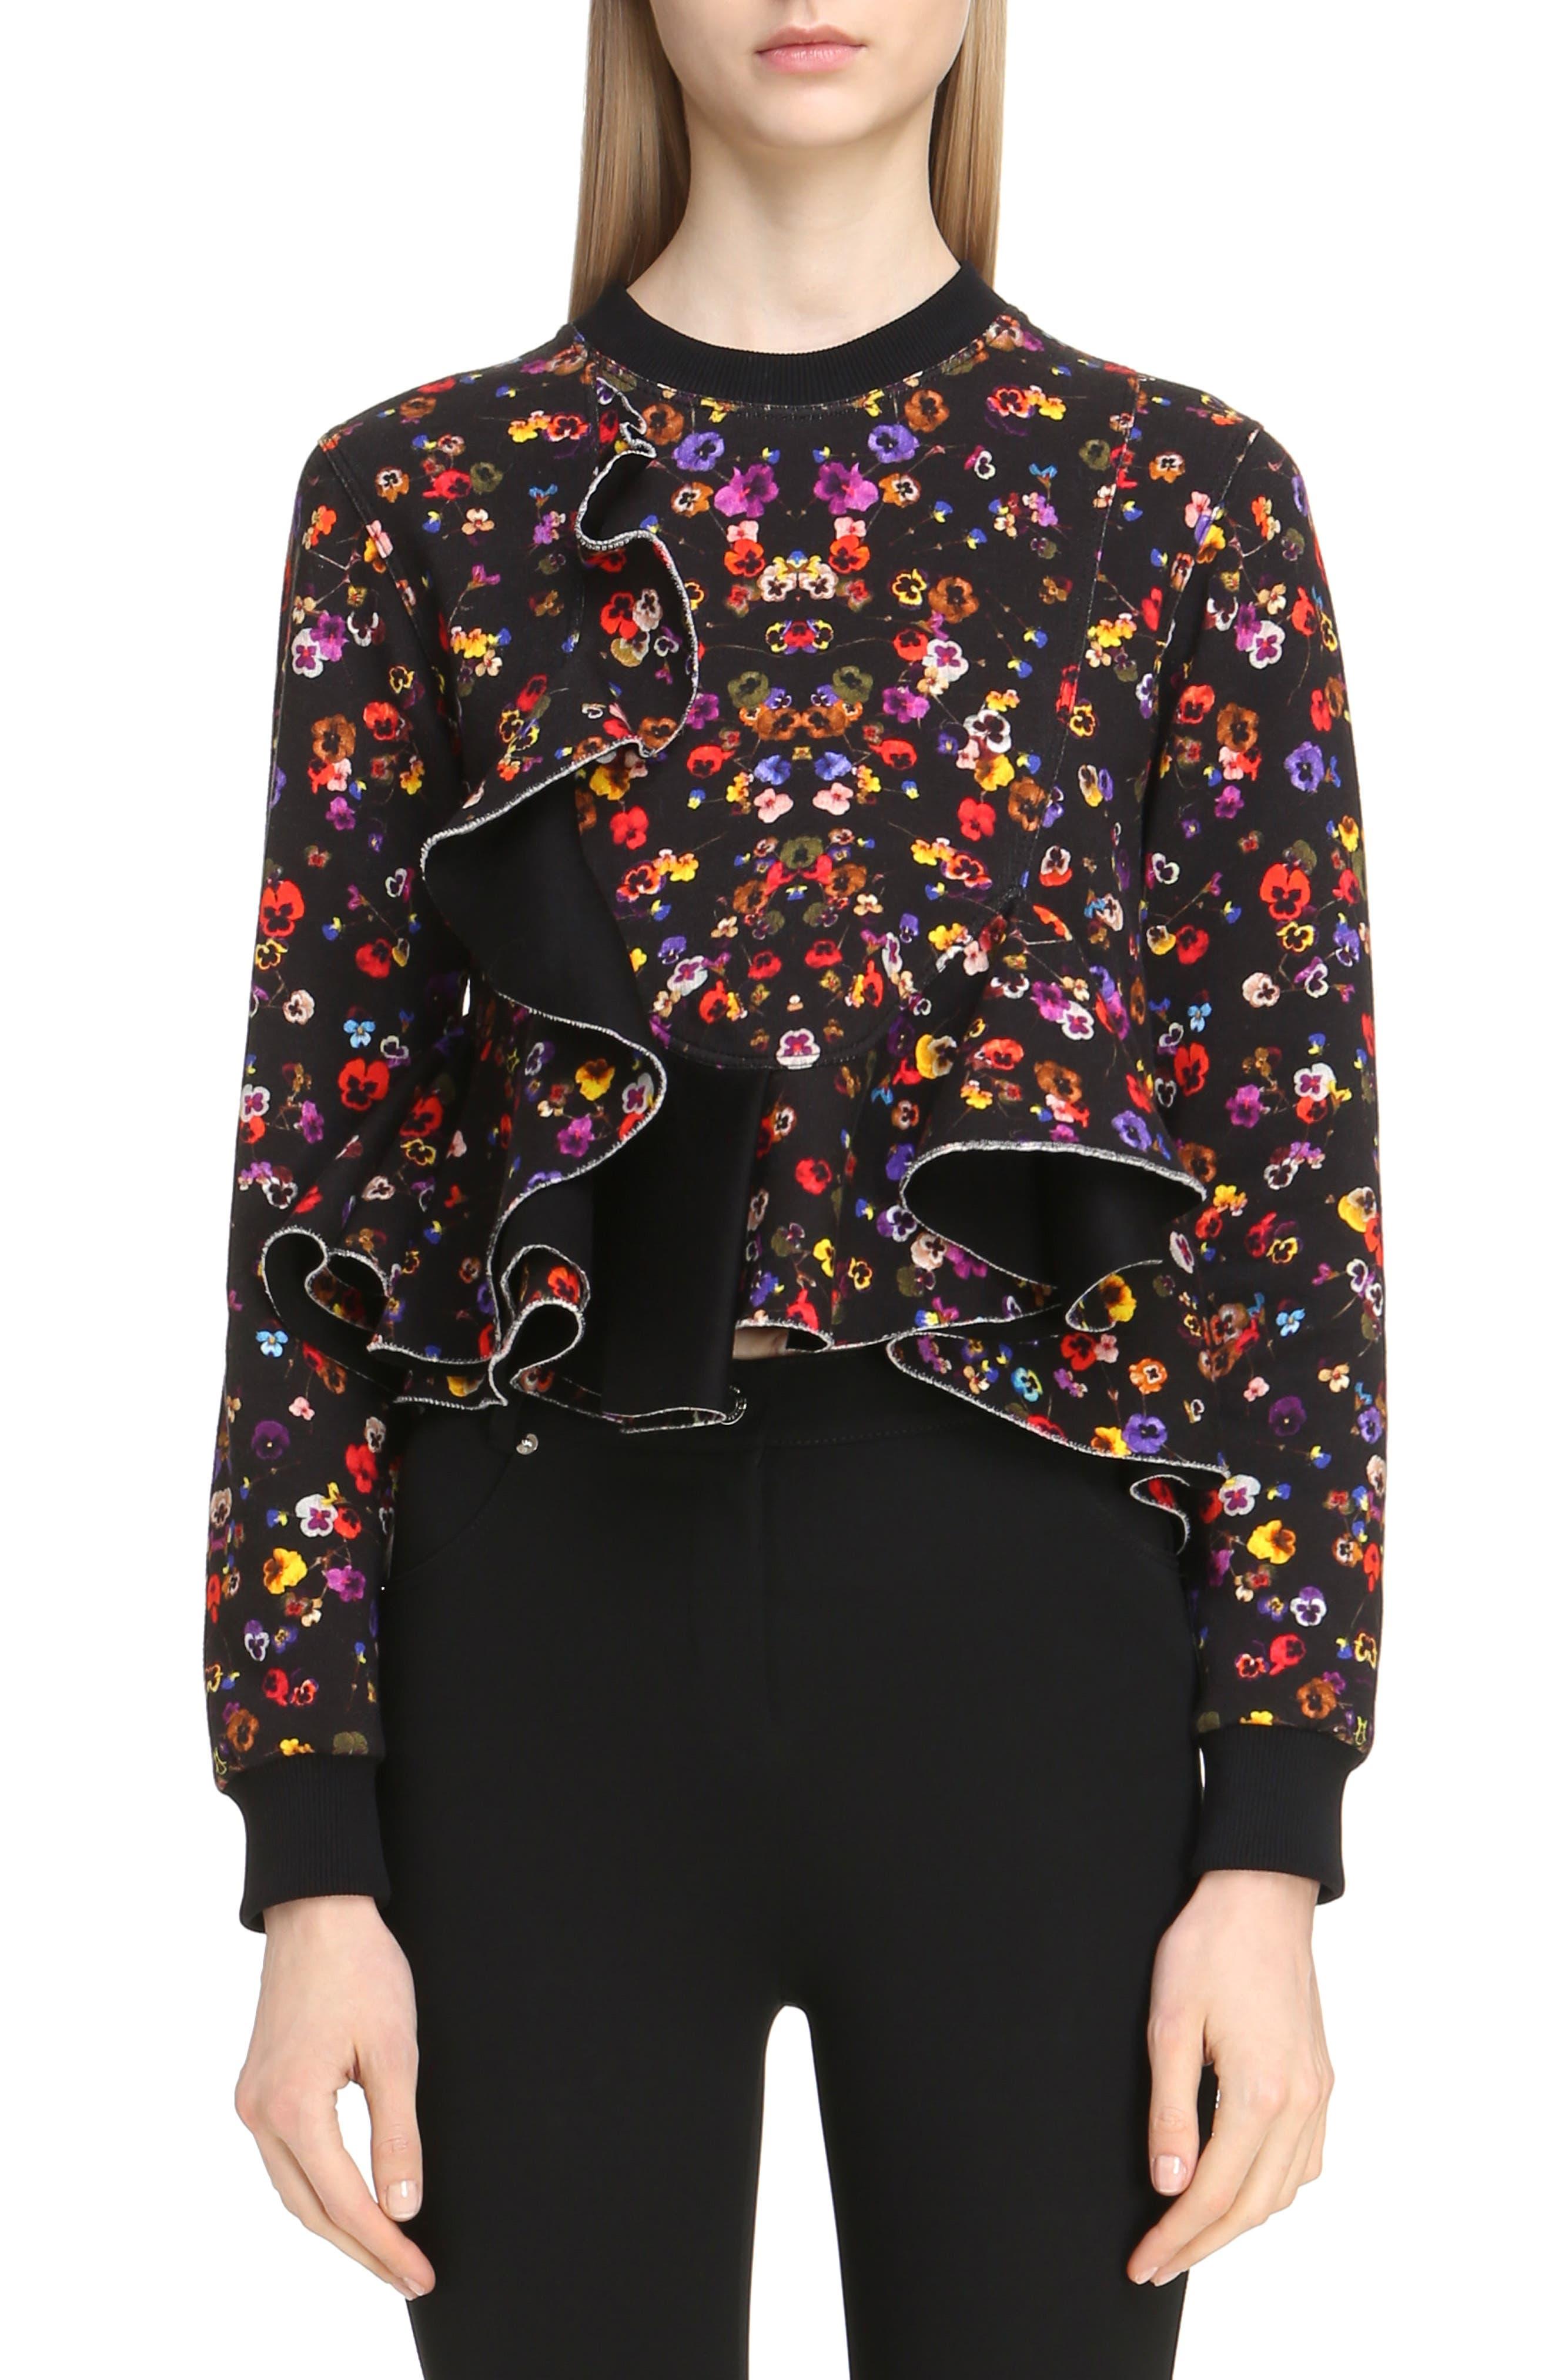 Givenchy Floral Print Ruffle Bonded Sweatshirt